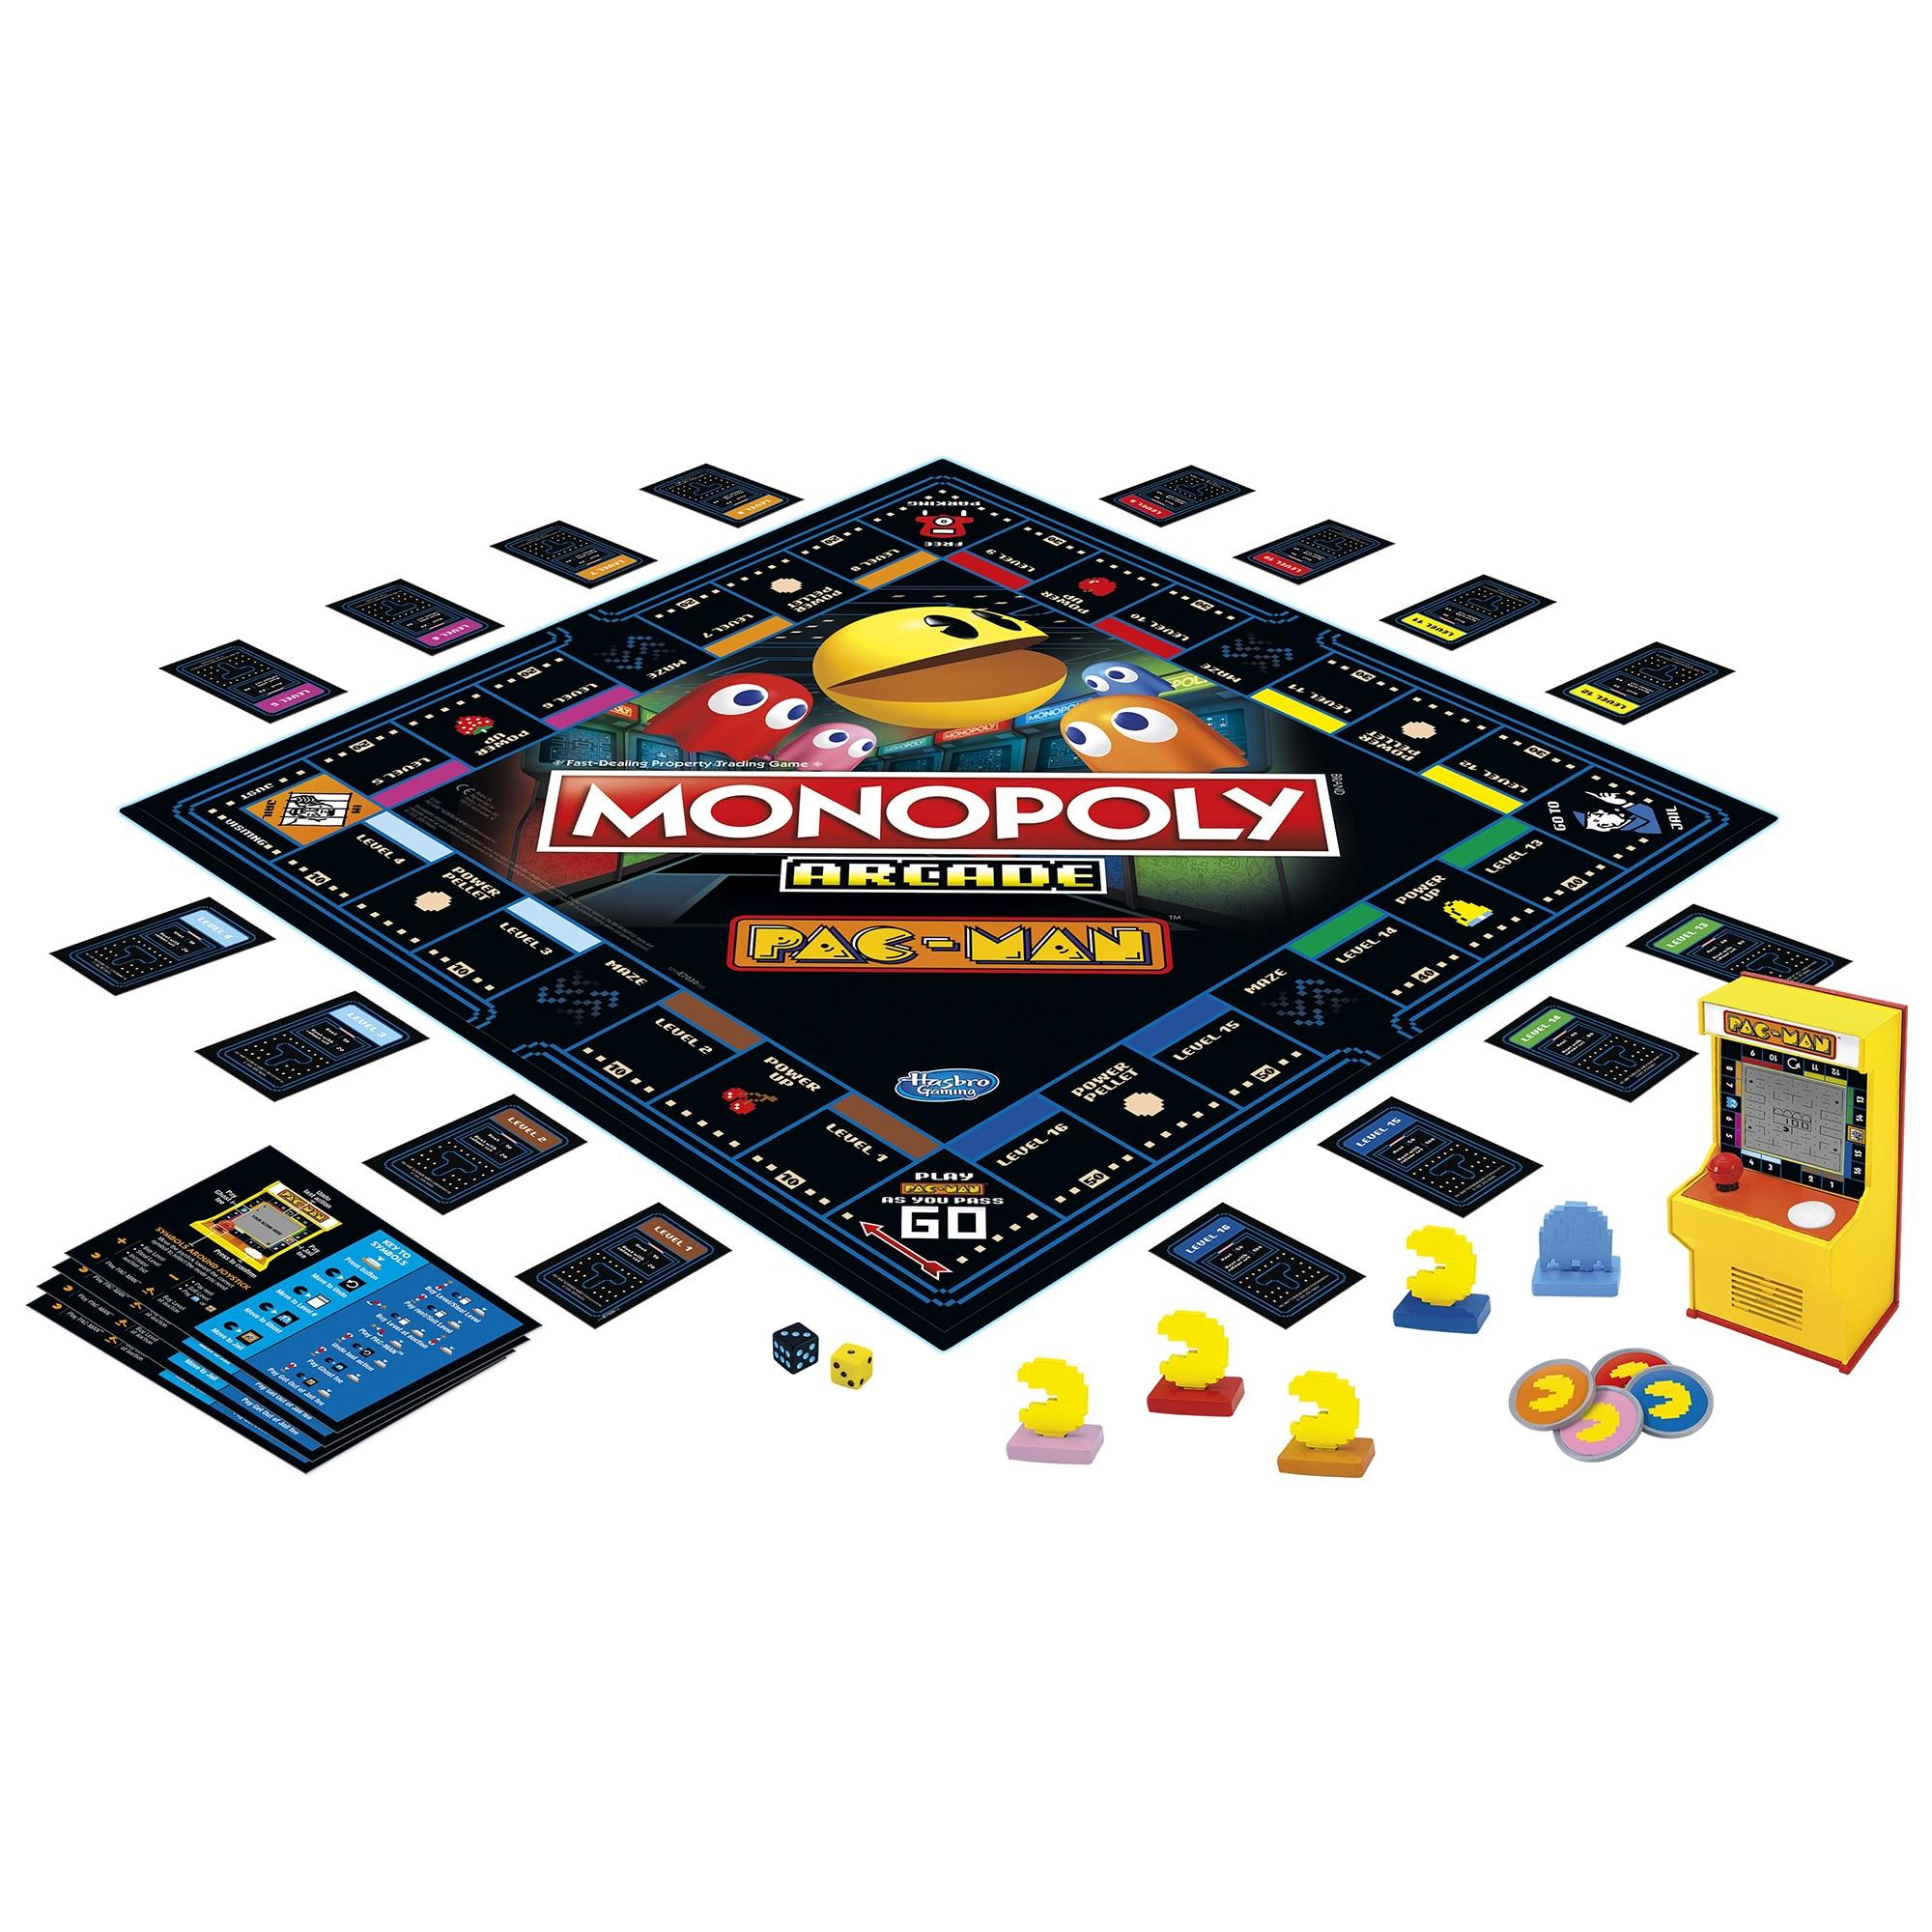 Joc - Monopoly - Arcade Pac-Man | Hasbro - 4